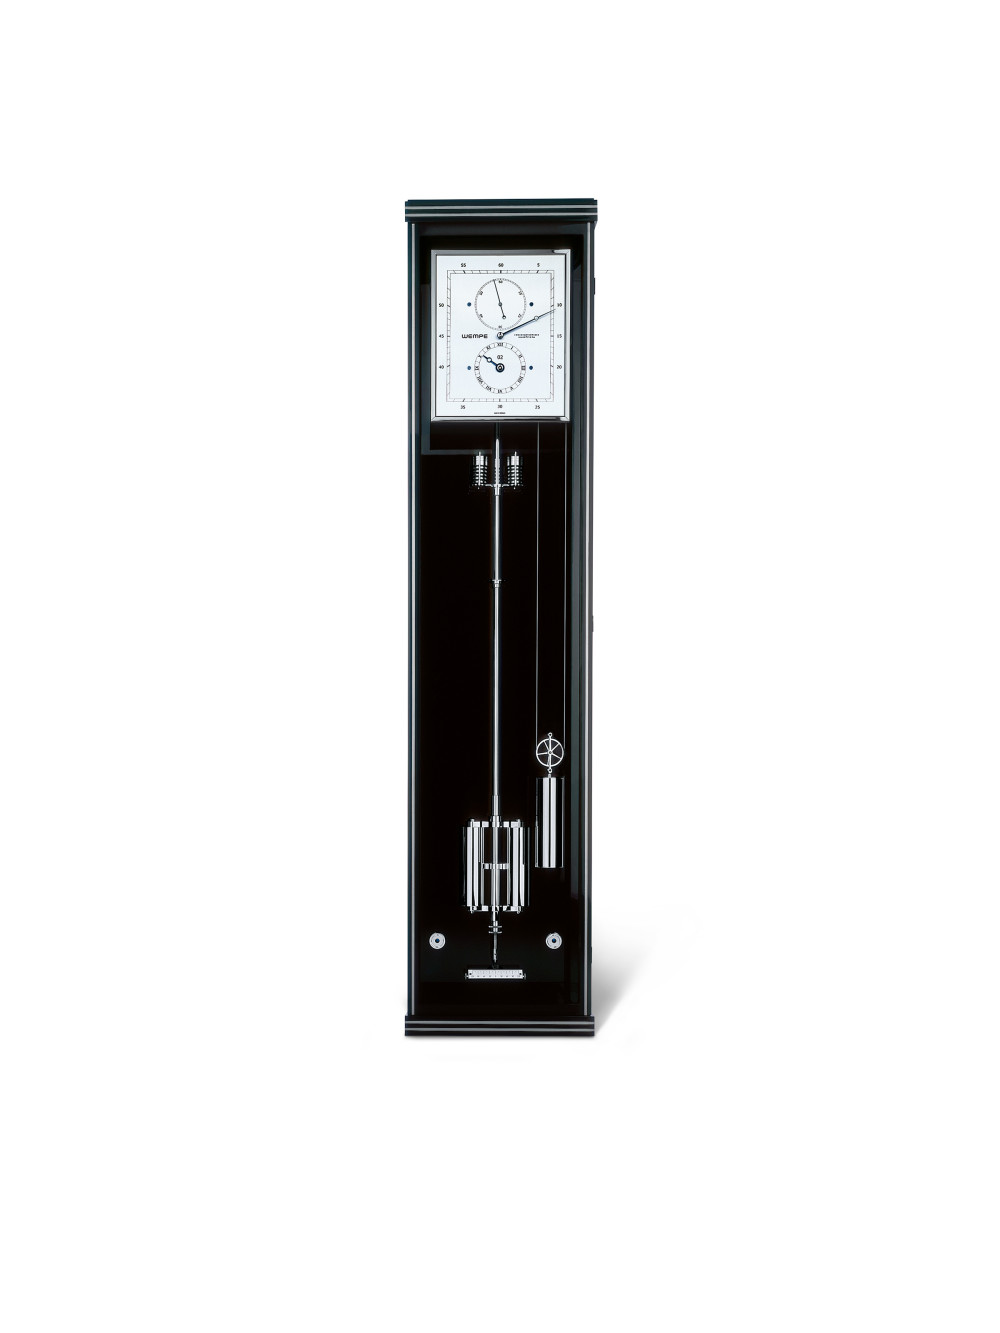 Chronometerwerke Präzisionspendeluhr 01